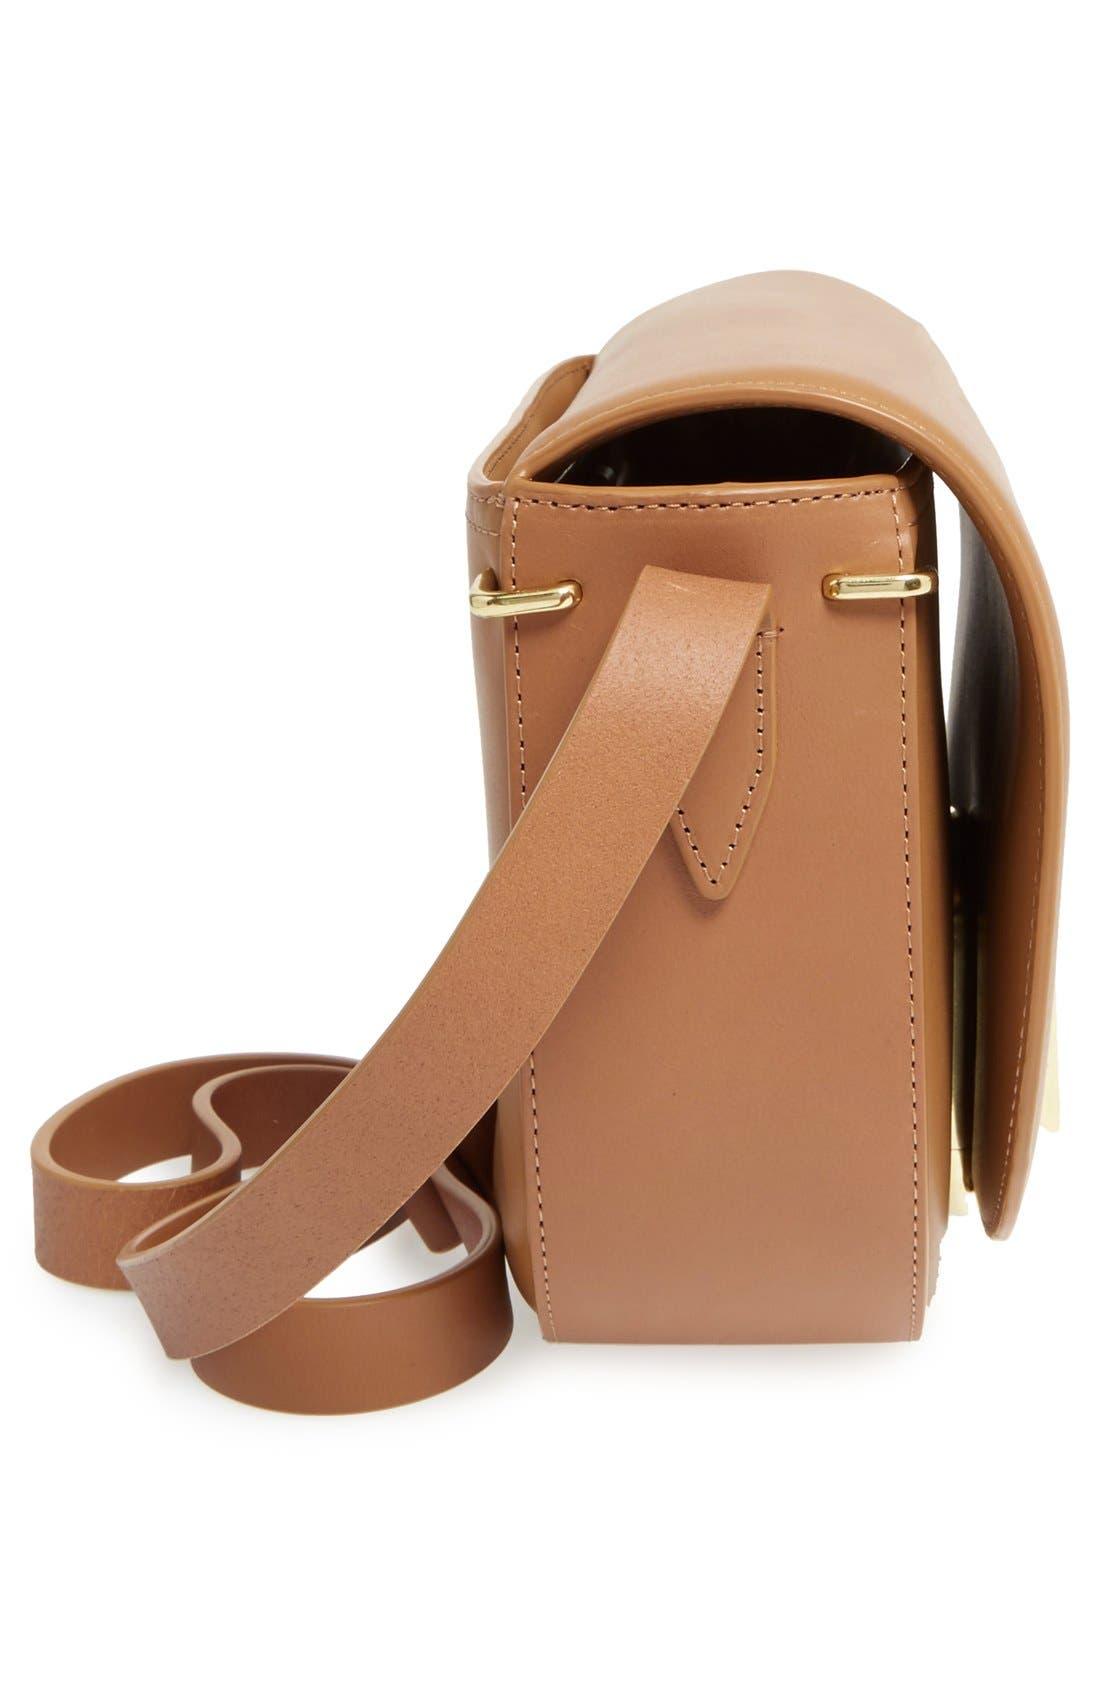 Alix Leather Saddle Bag,                             Alternate thumbnail 14, color,